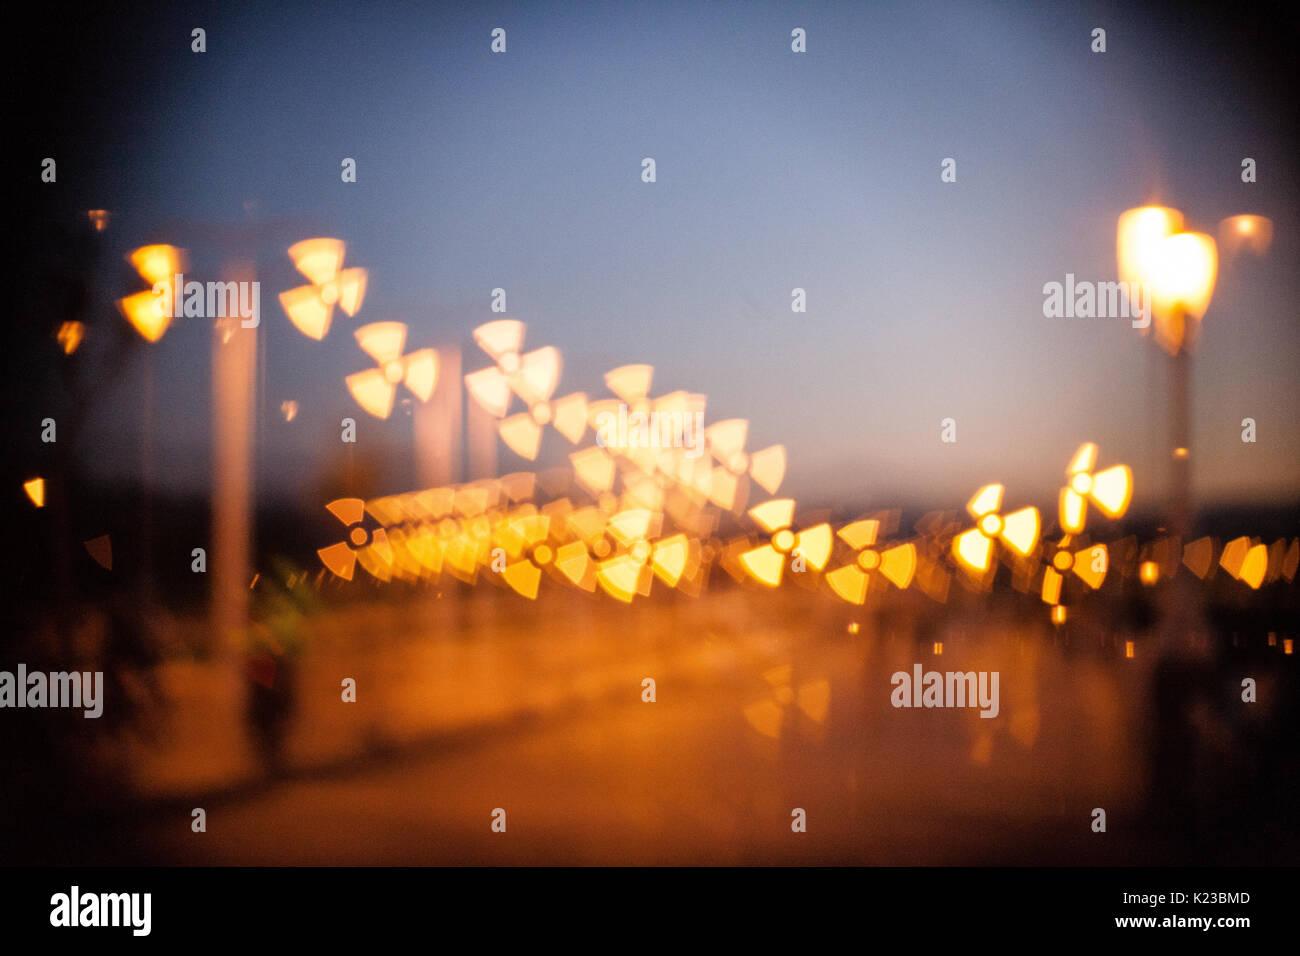 Street lights with radiation symbol Stock Photo